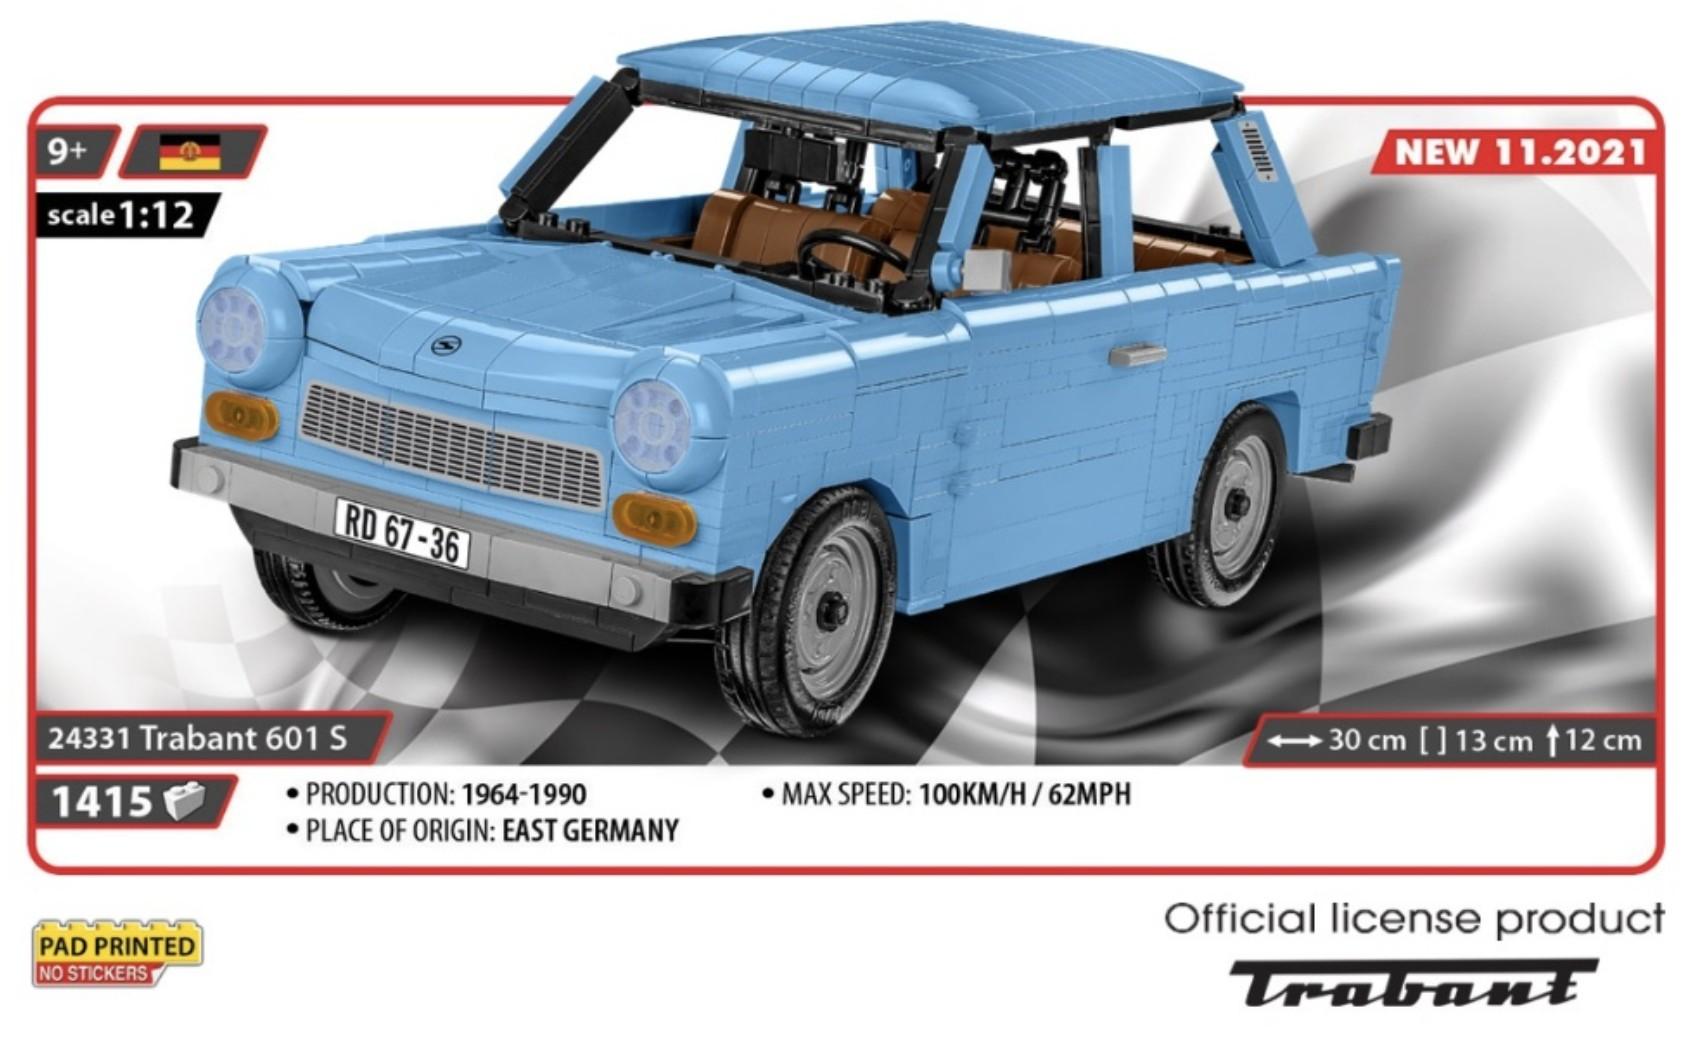 24331 - Trabant 601 S